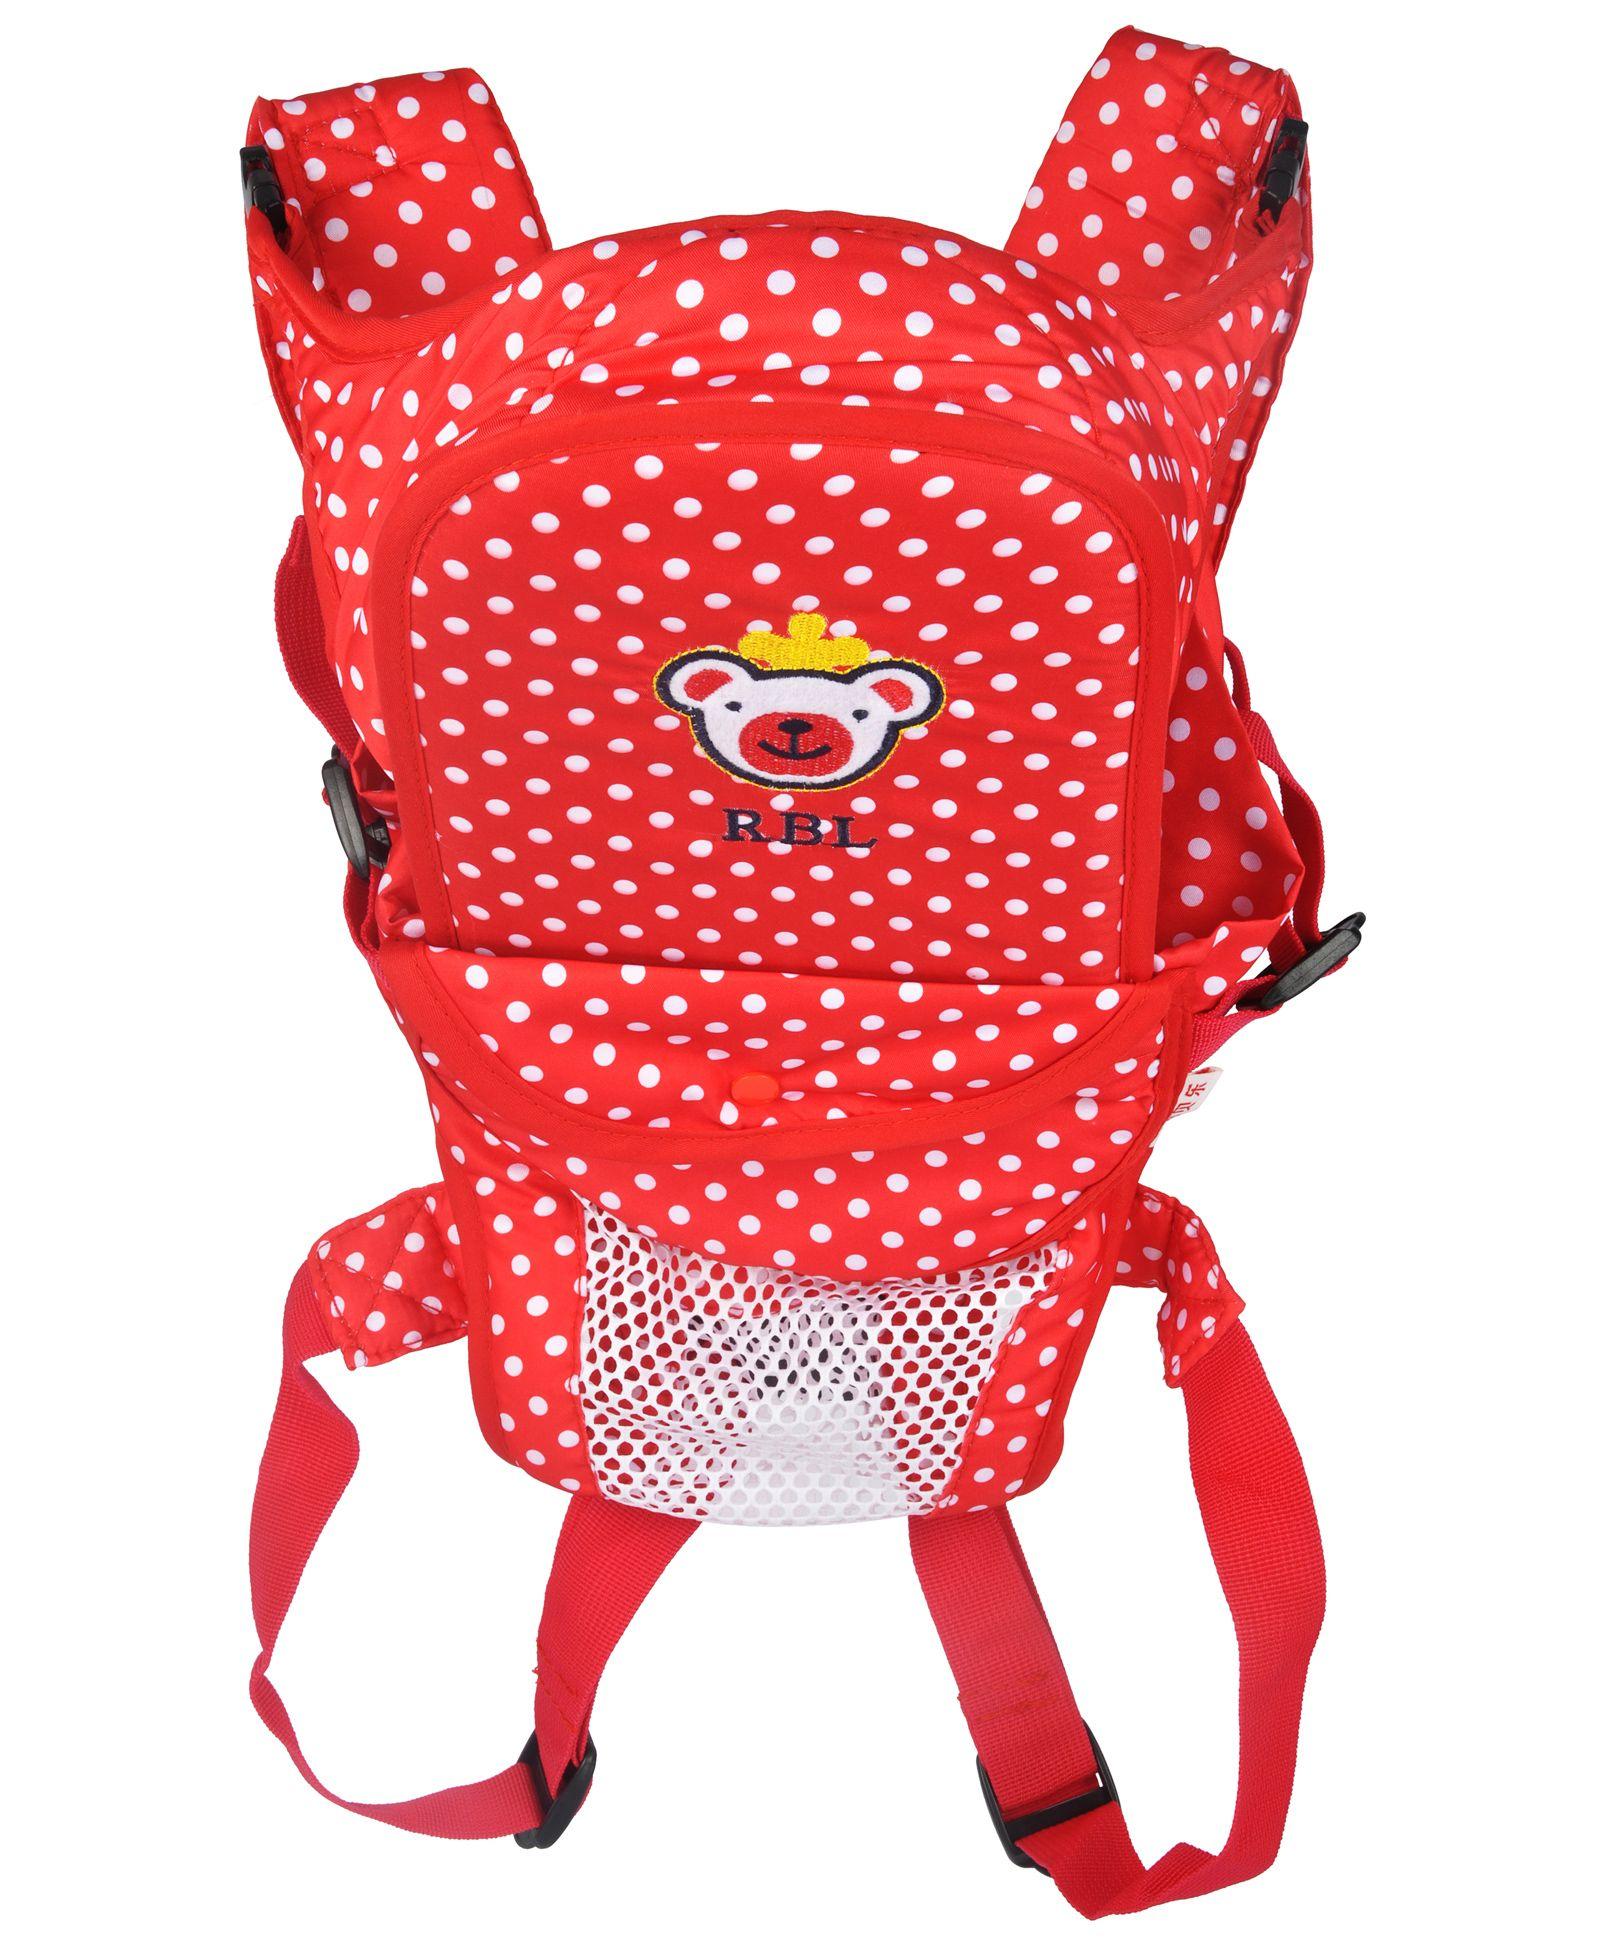 Kiwi 3 Way Baby Carrier Polka Dots - Red